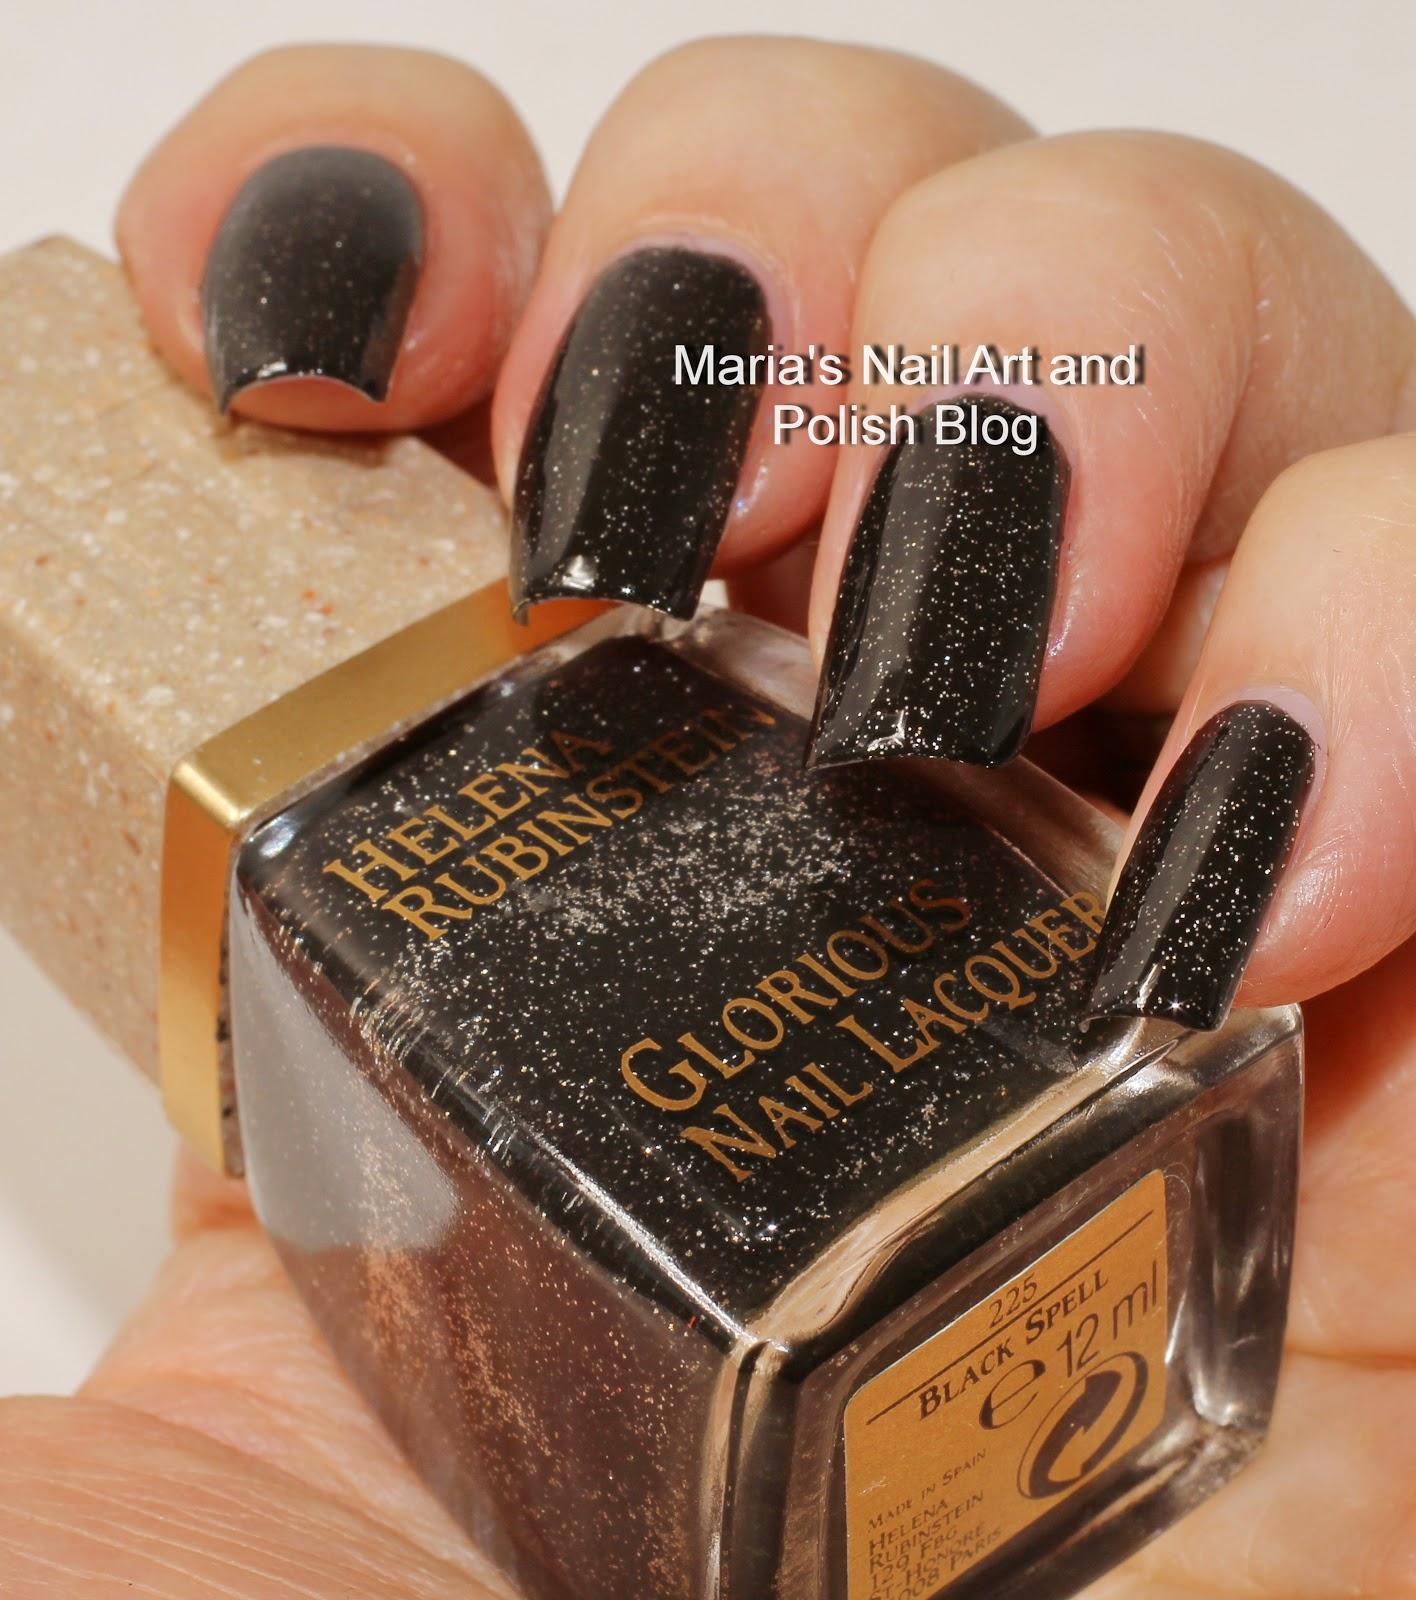 Marias Nail Art And Polish Blog: Helena Rubinstein 225